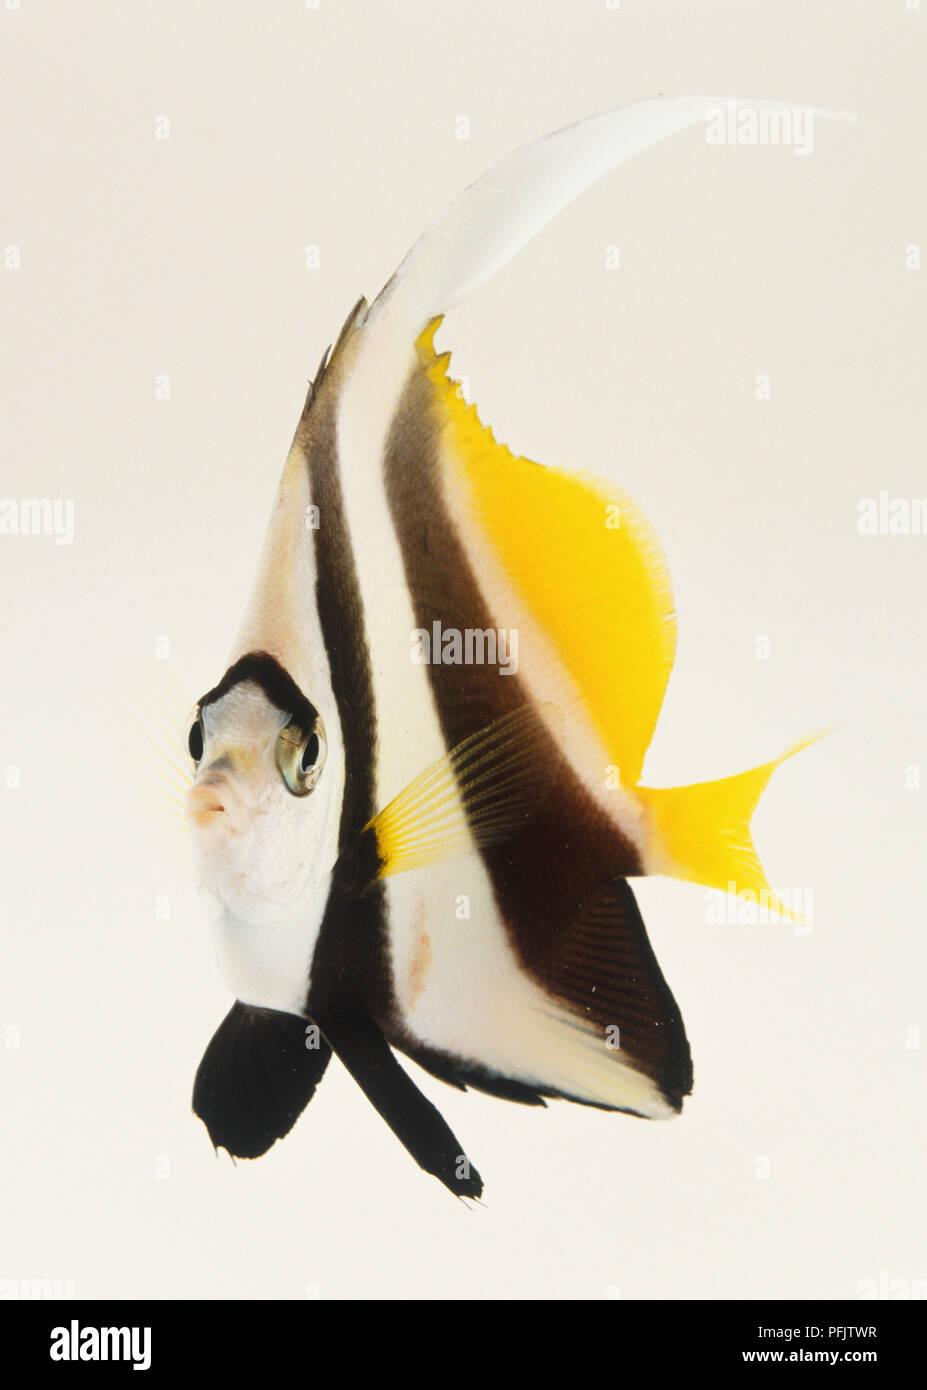 Pennant Coralfish or Coachman (Heniochus acuminatus), side view - Stock Image